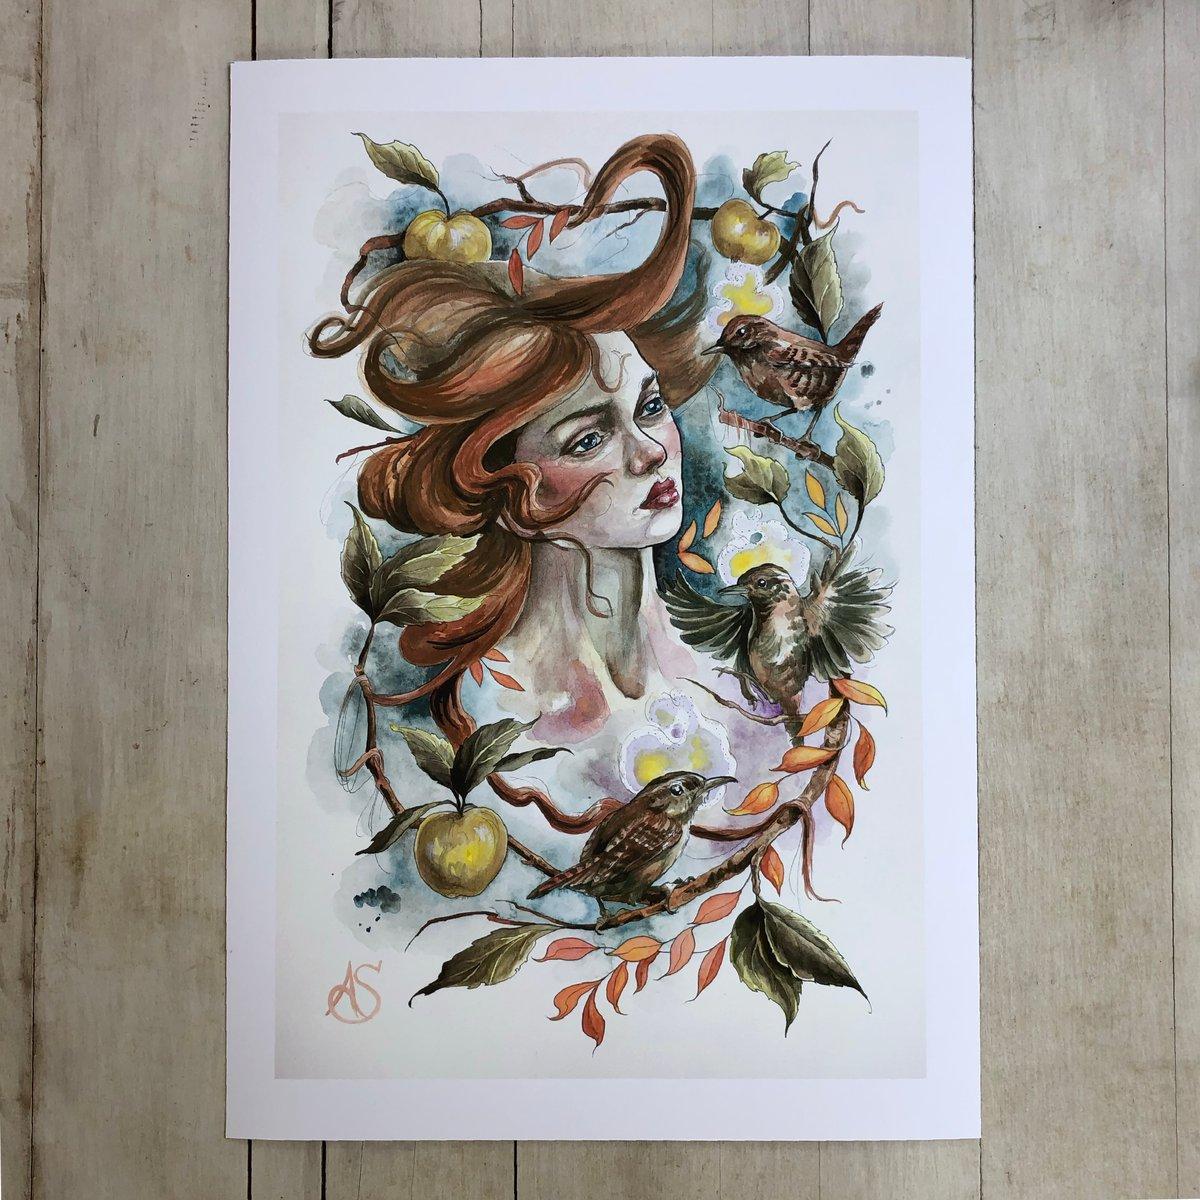 "Cliodhna   14 X 20"" Large Print"